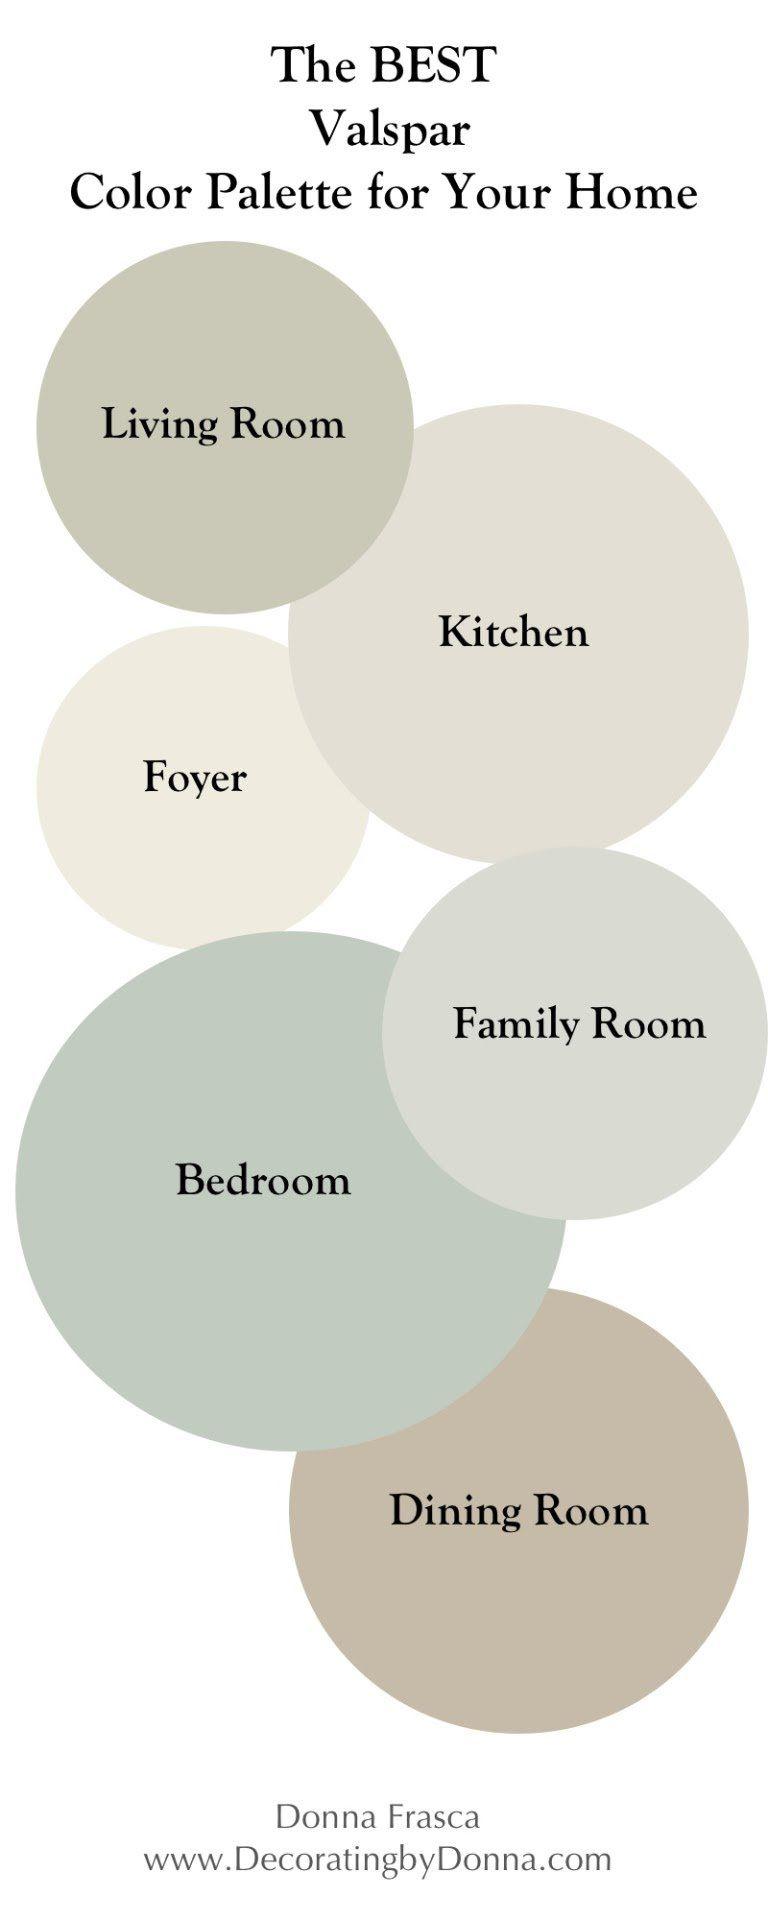 the best valspar color palette for your home valspar on best valspar paint colors id=19672